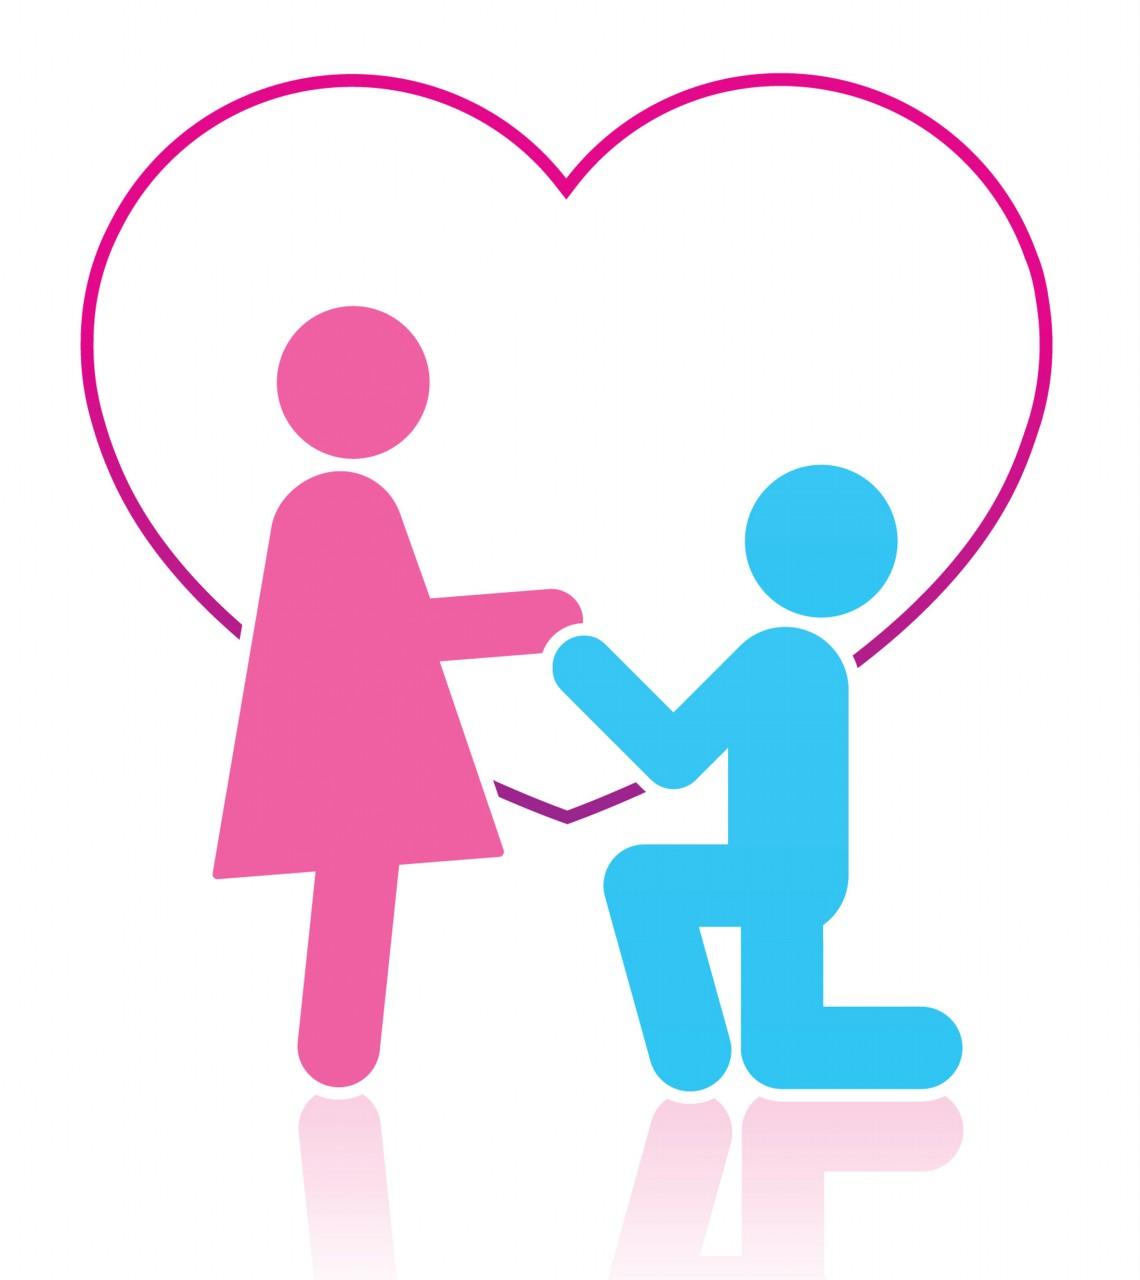 Clip art for love clipart cli - Love Clipart